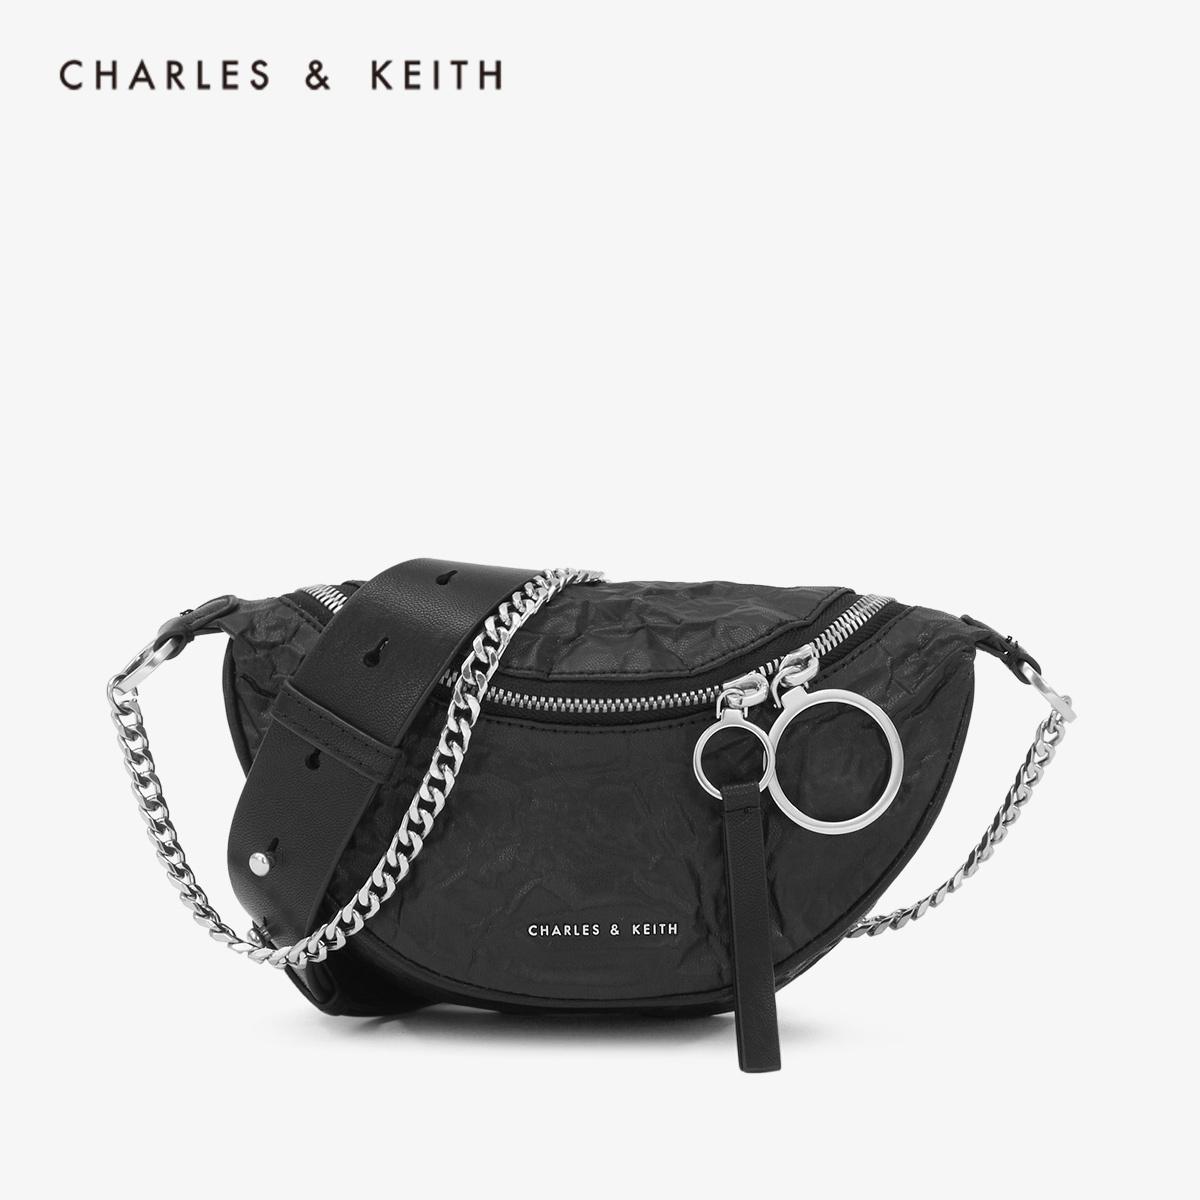 CHARLES&KEITH2019秋季新品CK2-80150844手提单肩包腰包女